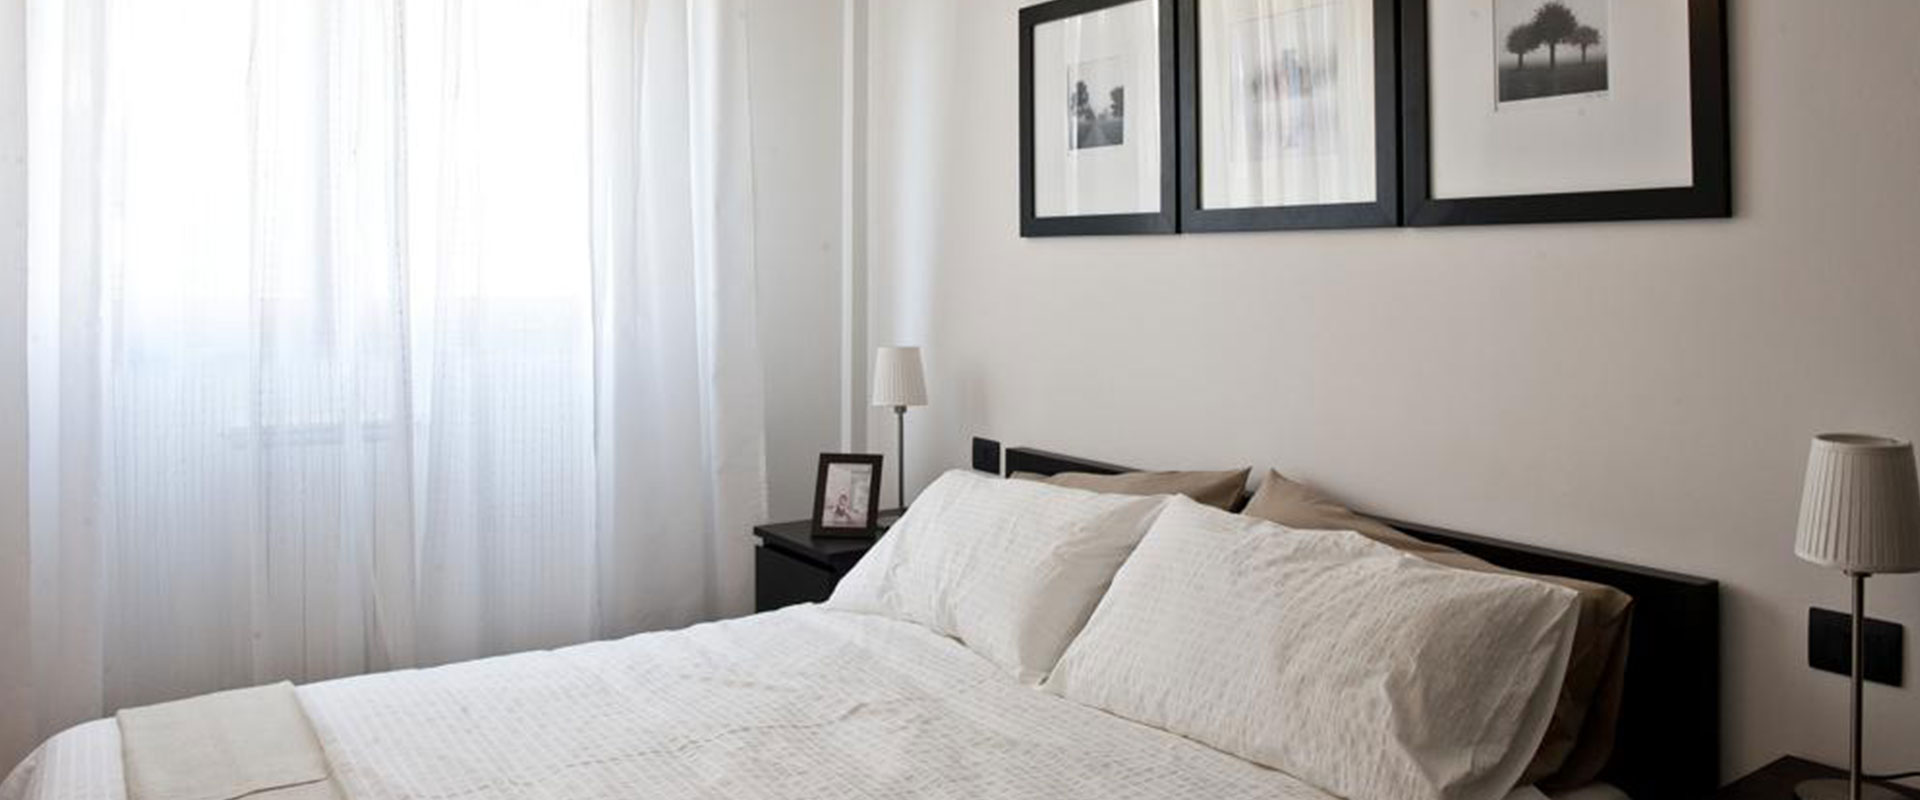 Corte Felice Residenza - camera matrimoniale